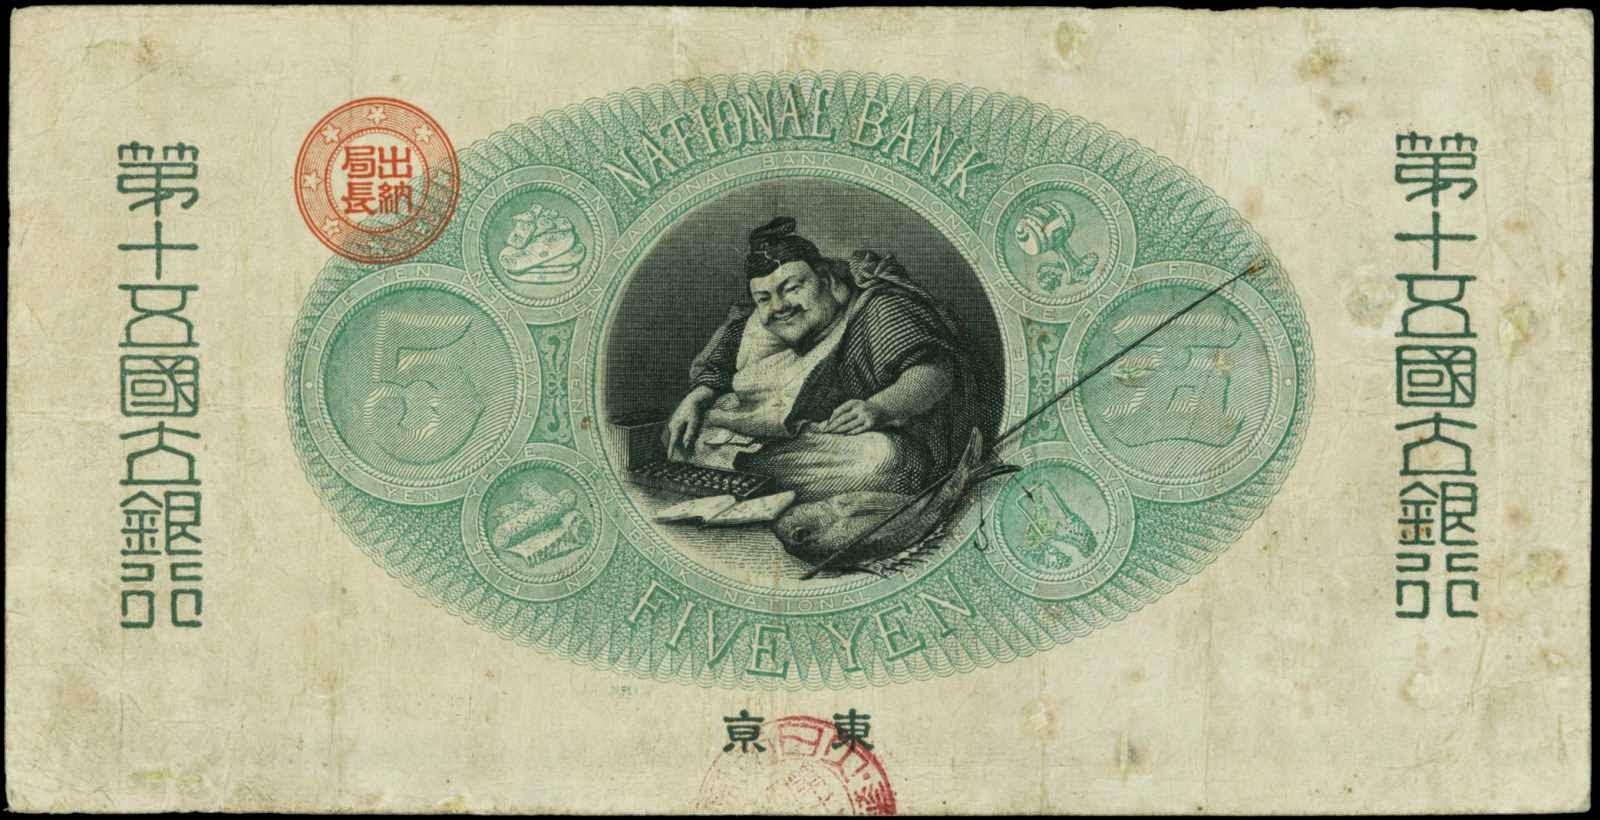 Japan Banknotes 5 Yen 1878 Ebisu